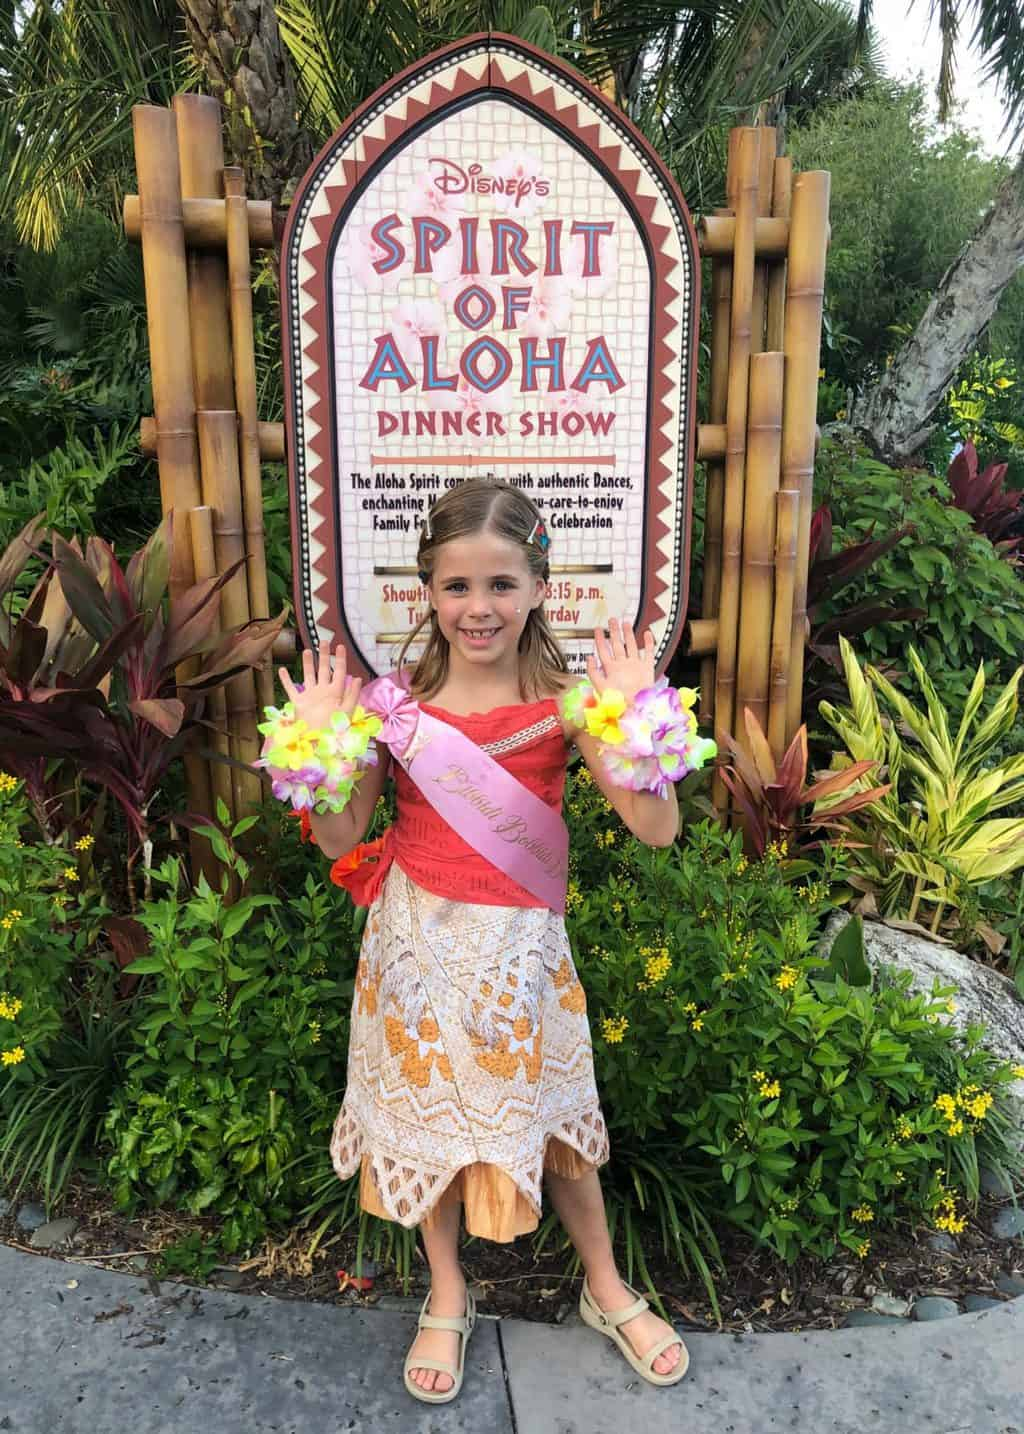 Britt's Disney 7th Bday: BBB and Spirit of Aloha Luau